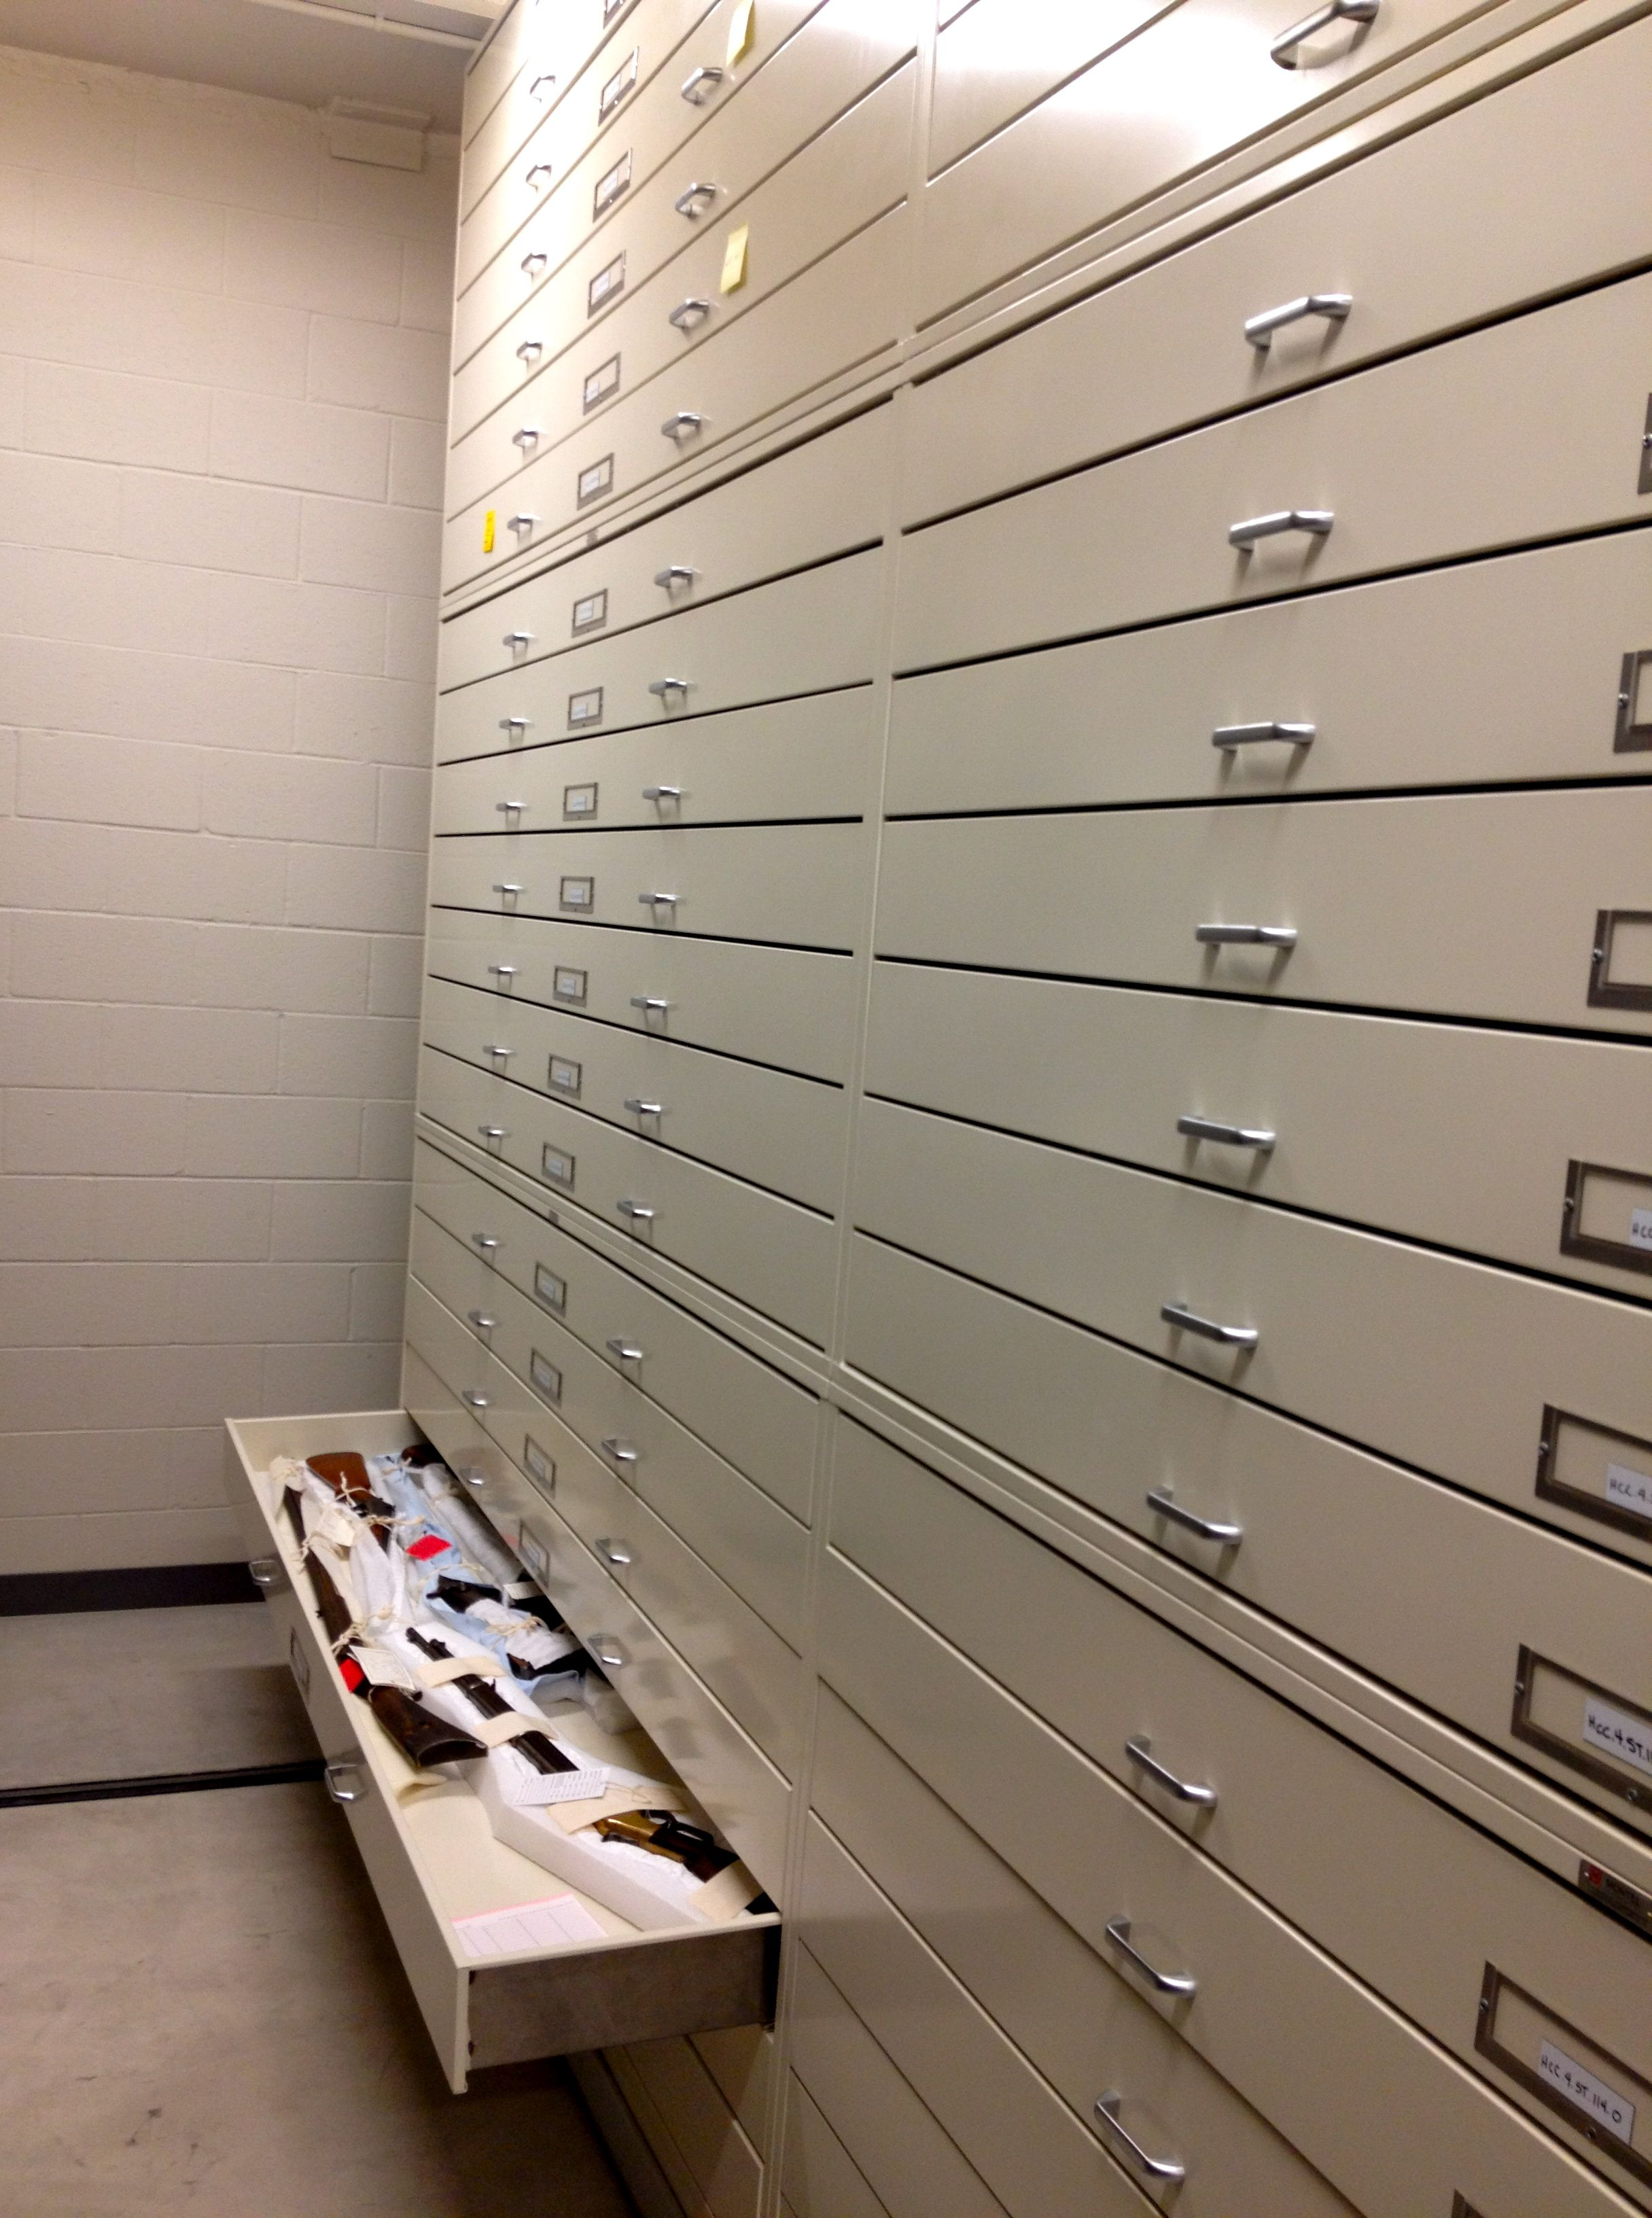 History Colorado Gun Storage in 40,000 sq ft